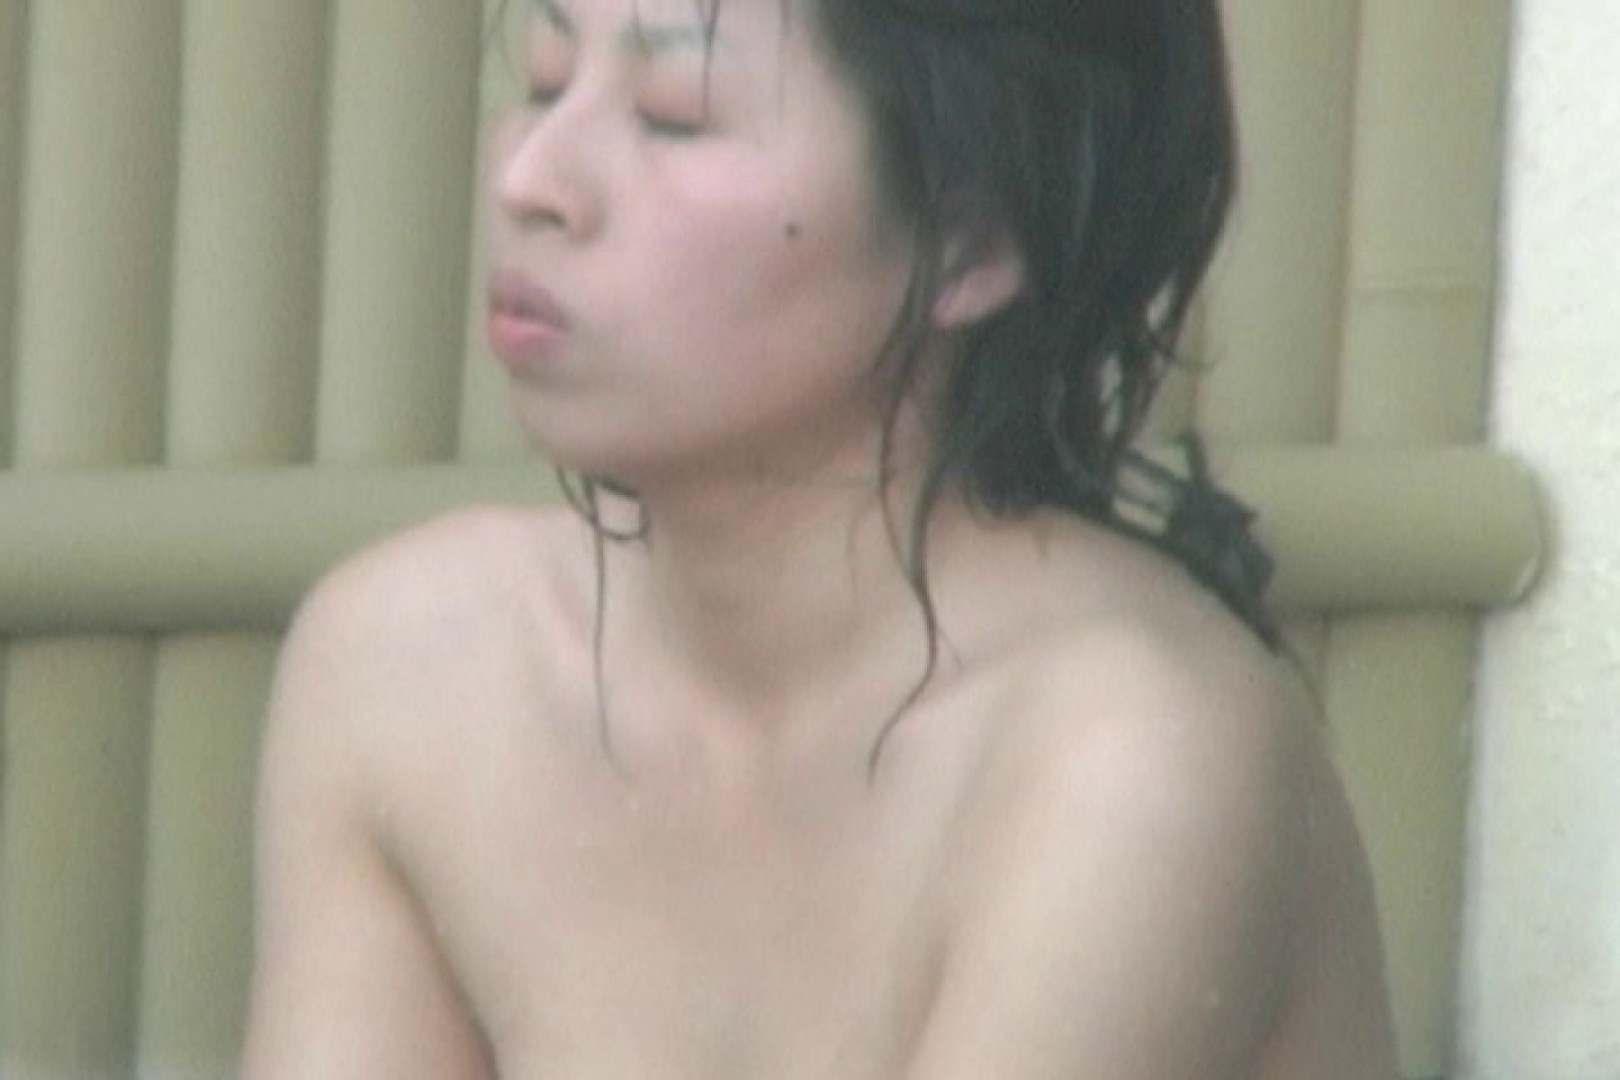 Aquaな露天風呂Vol.589 盗撮シリーズ | 露天風呂編  113PIX 105